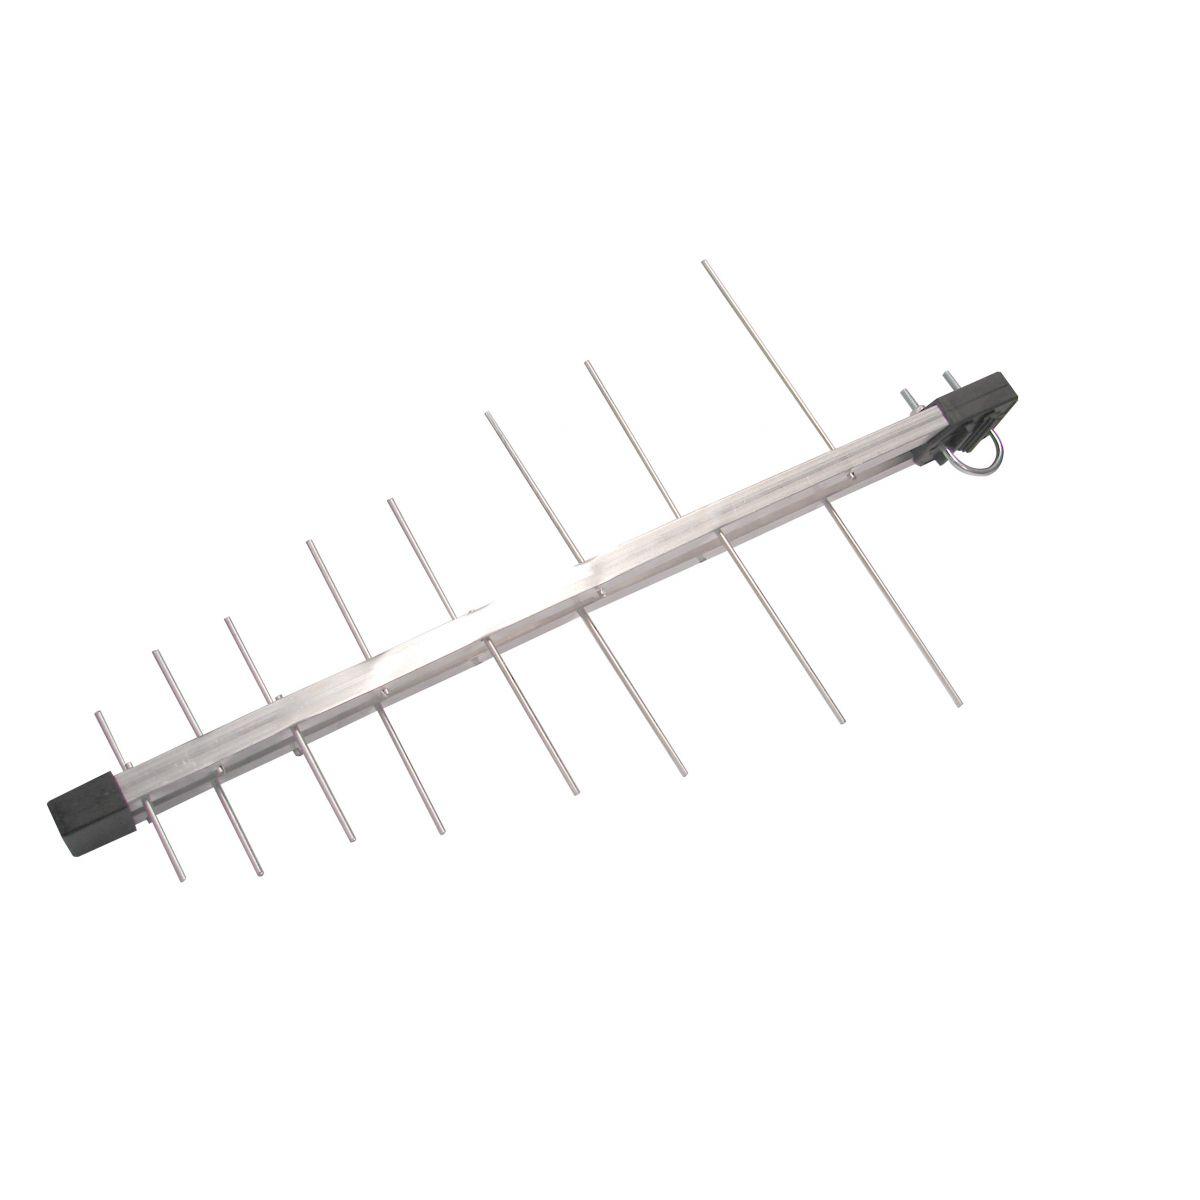 Kit Antena Tv Digital Externa Log 16 Elementos c/ Mastro Articulado 50 cm e Cabo Coaxial Capte 10 metros